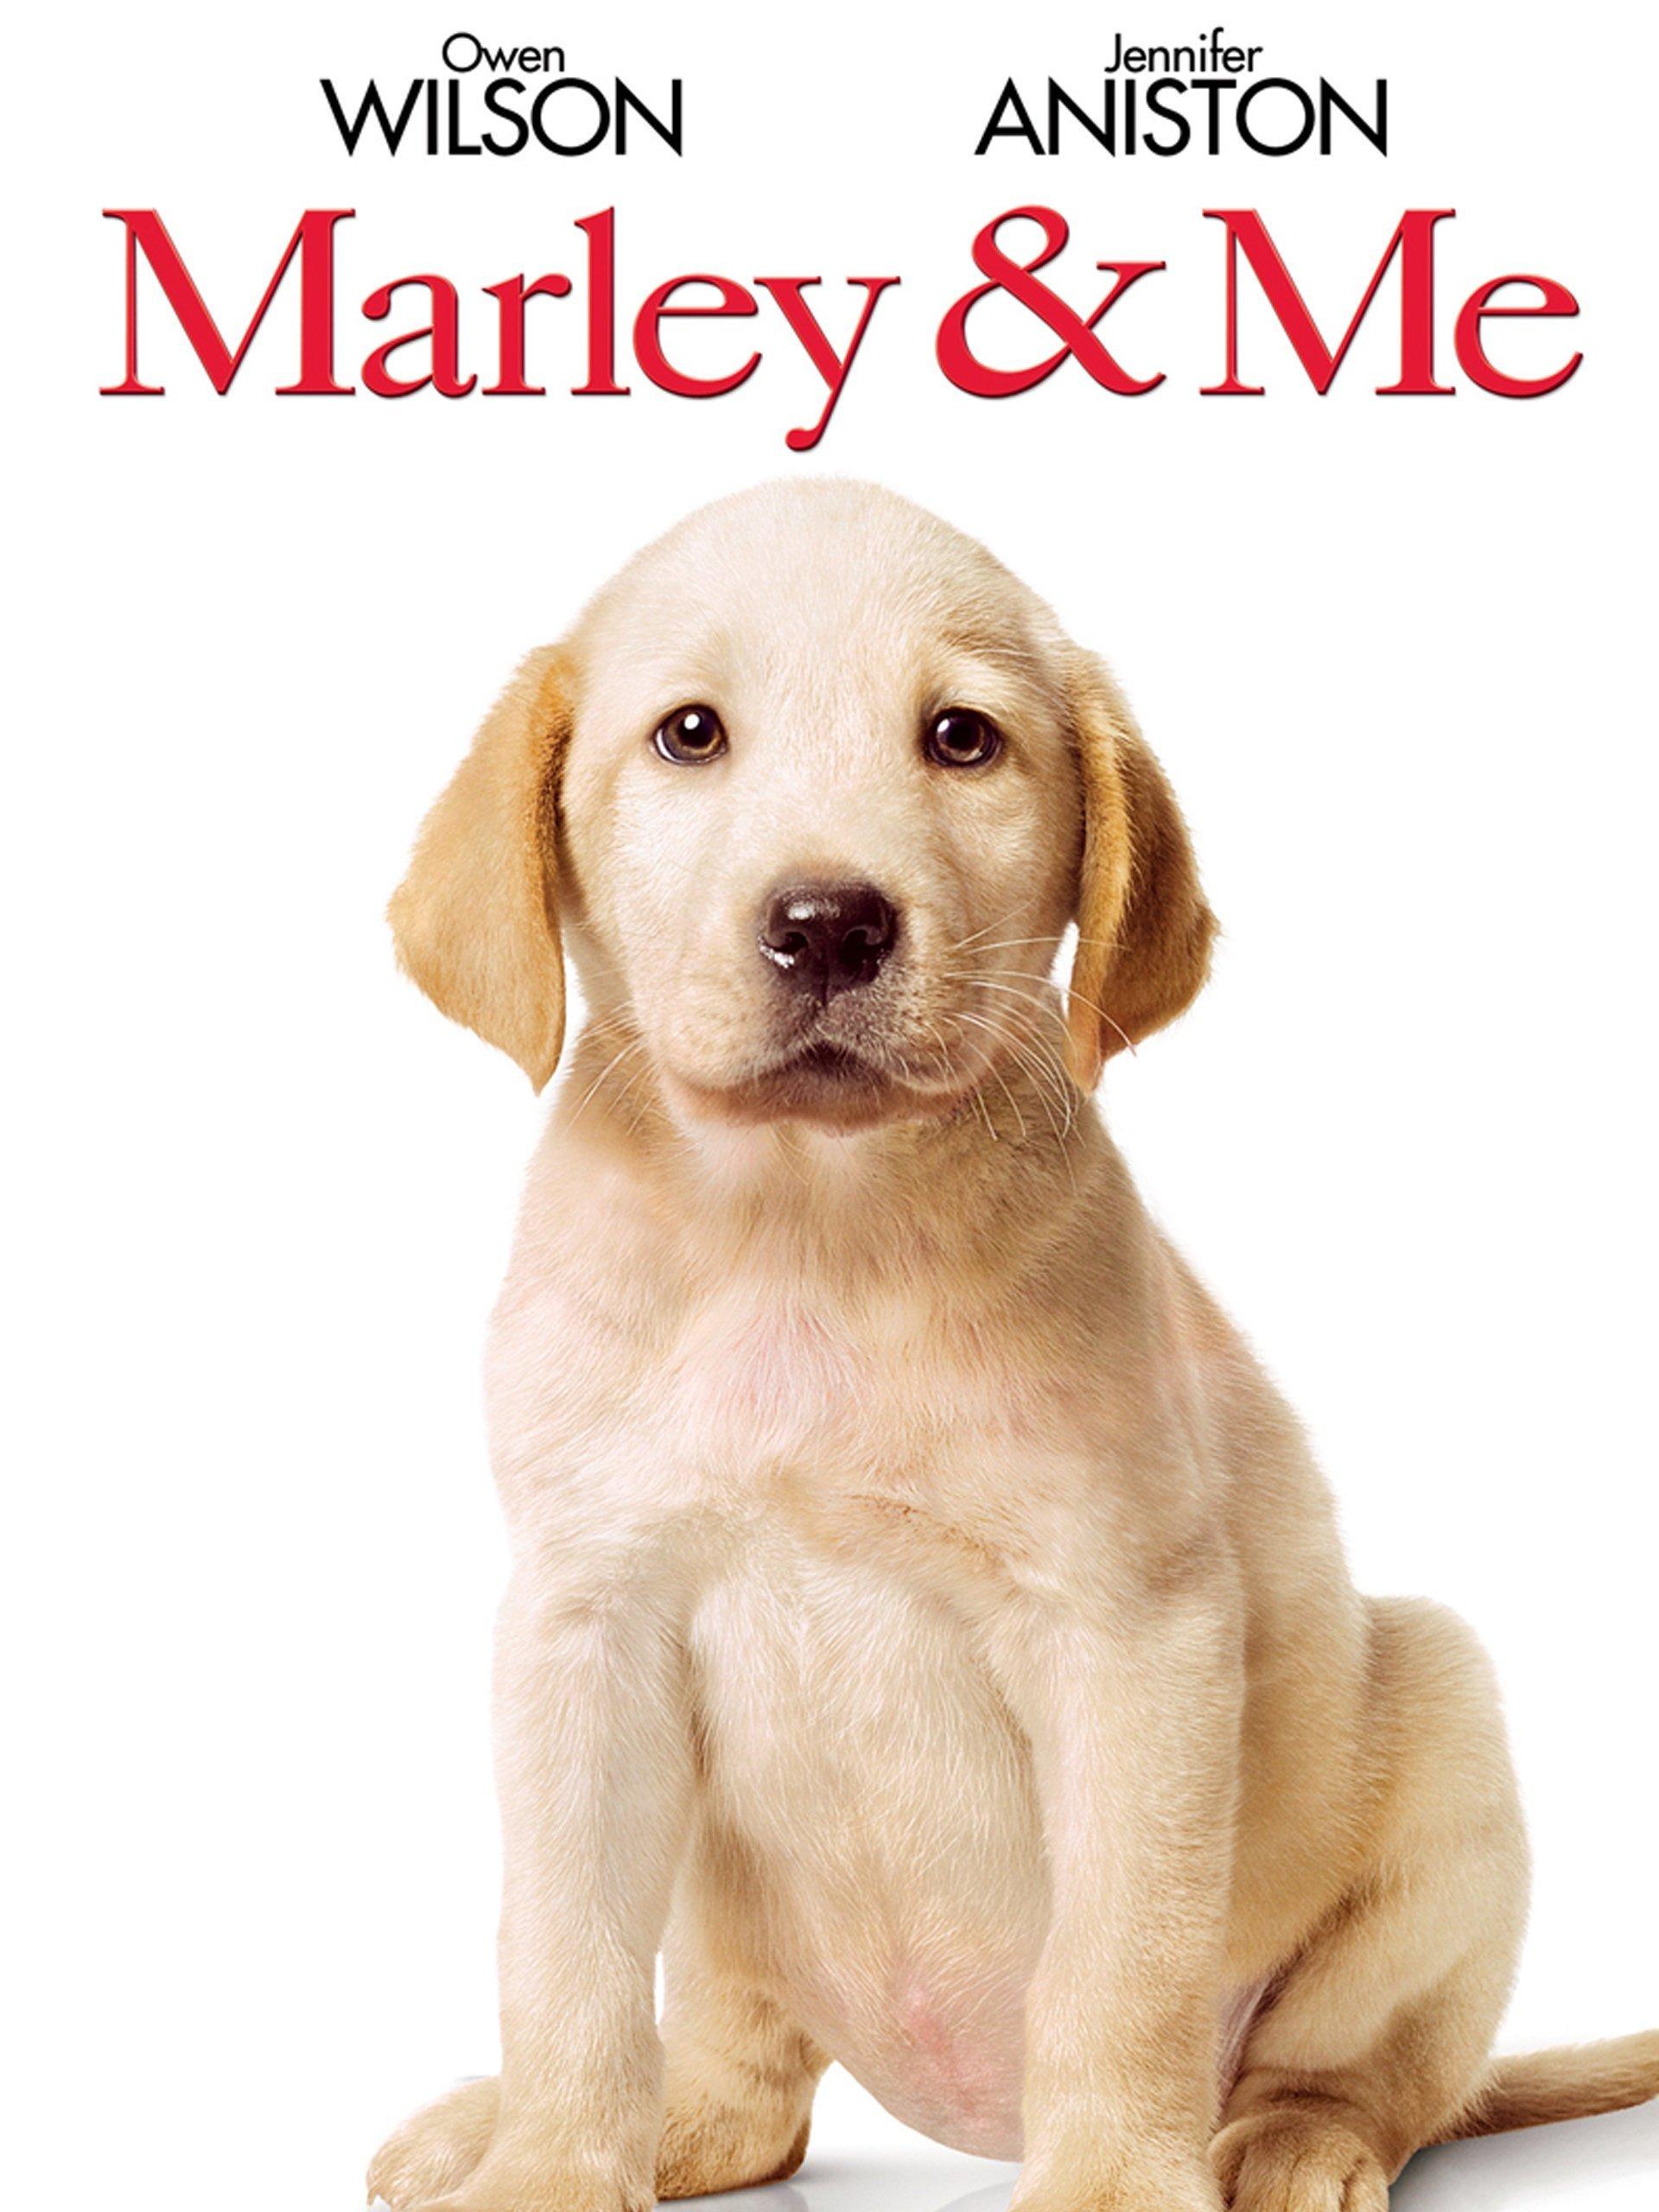 Amazon.com: Watch Marley & Me | Prime Video